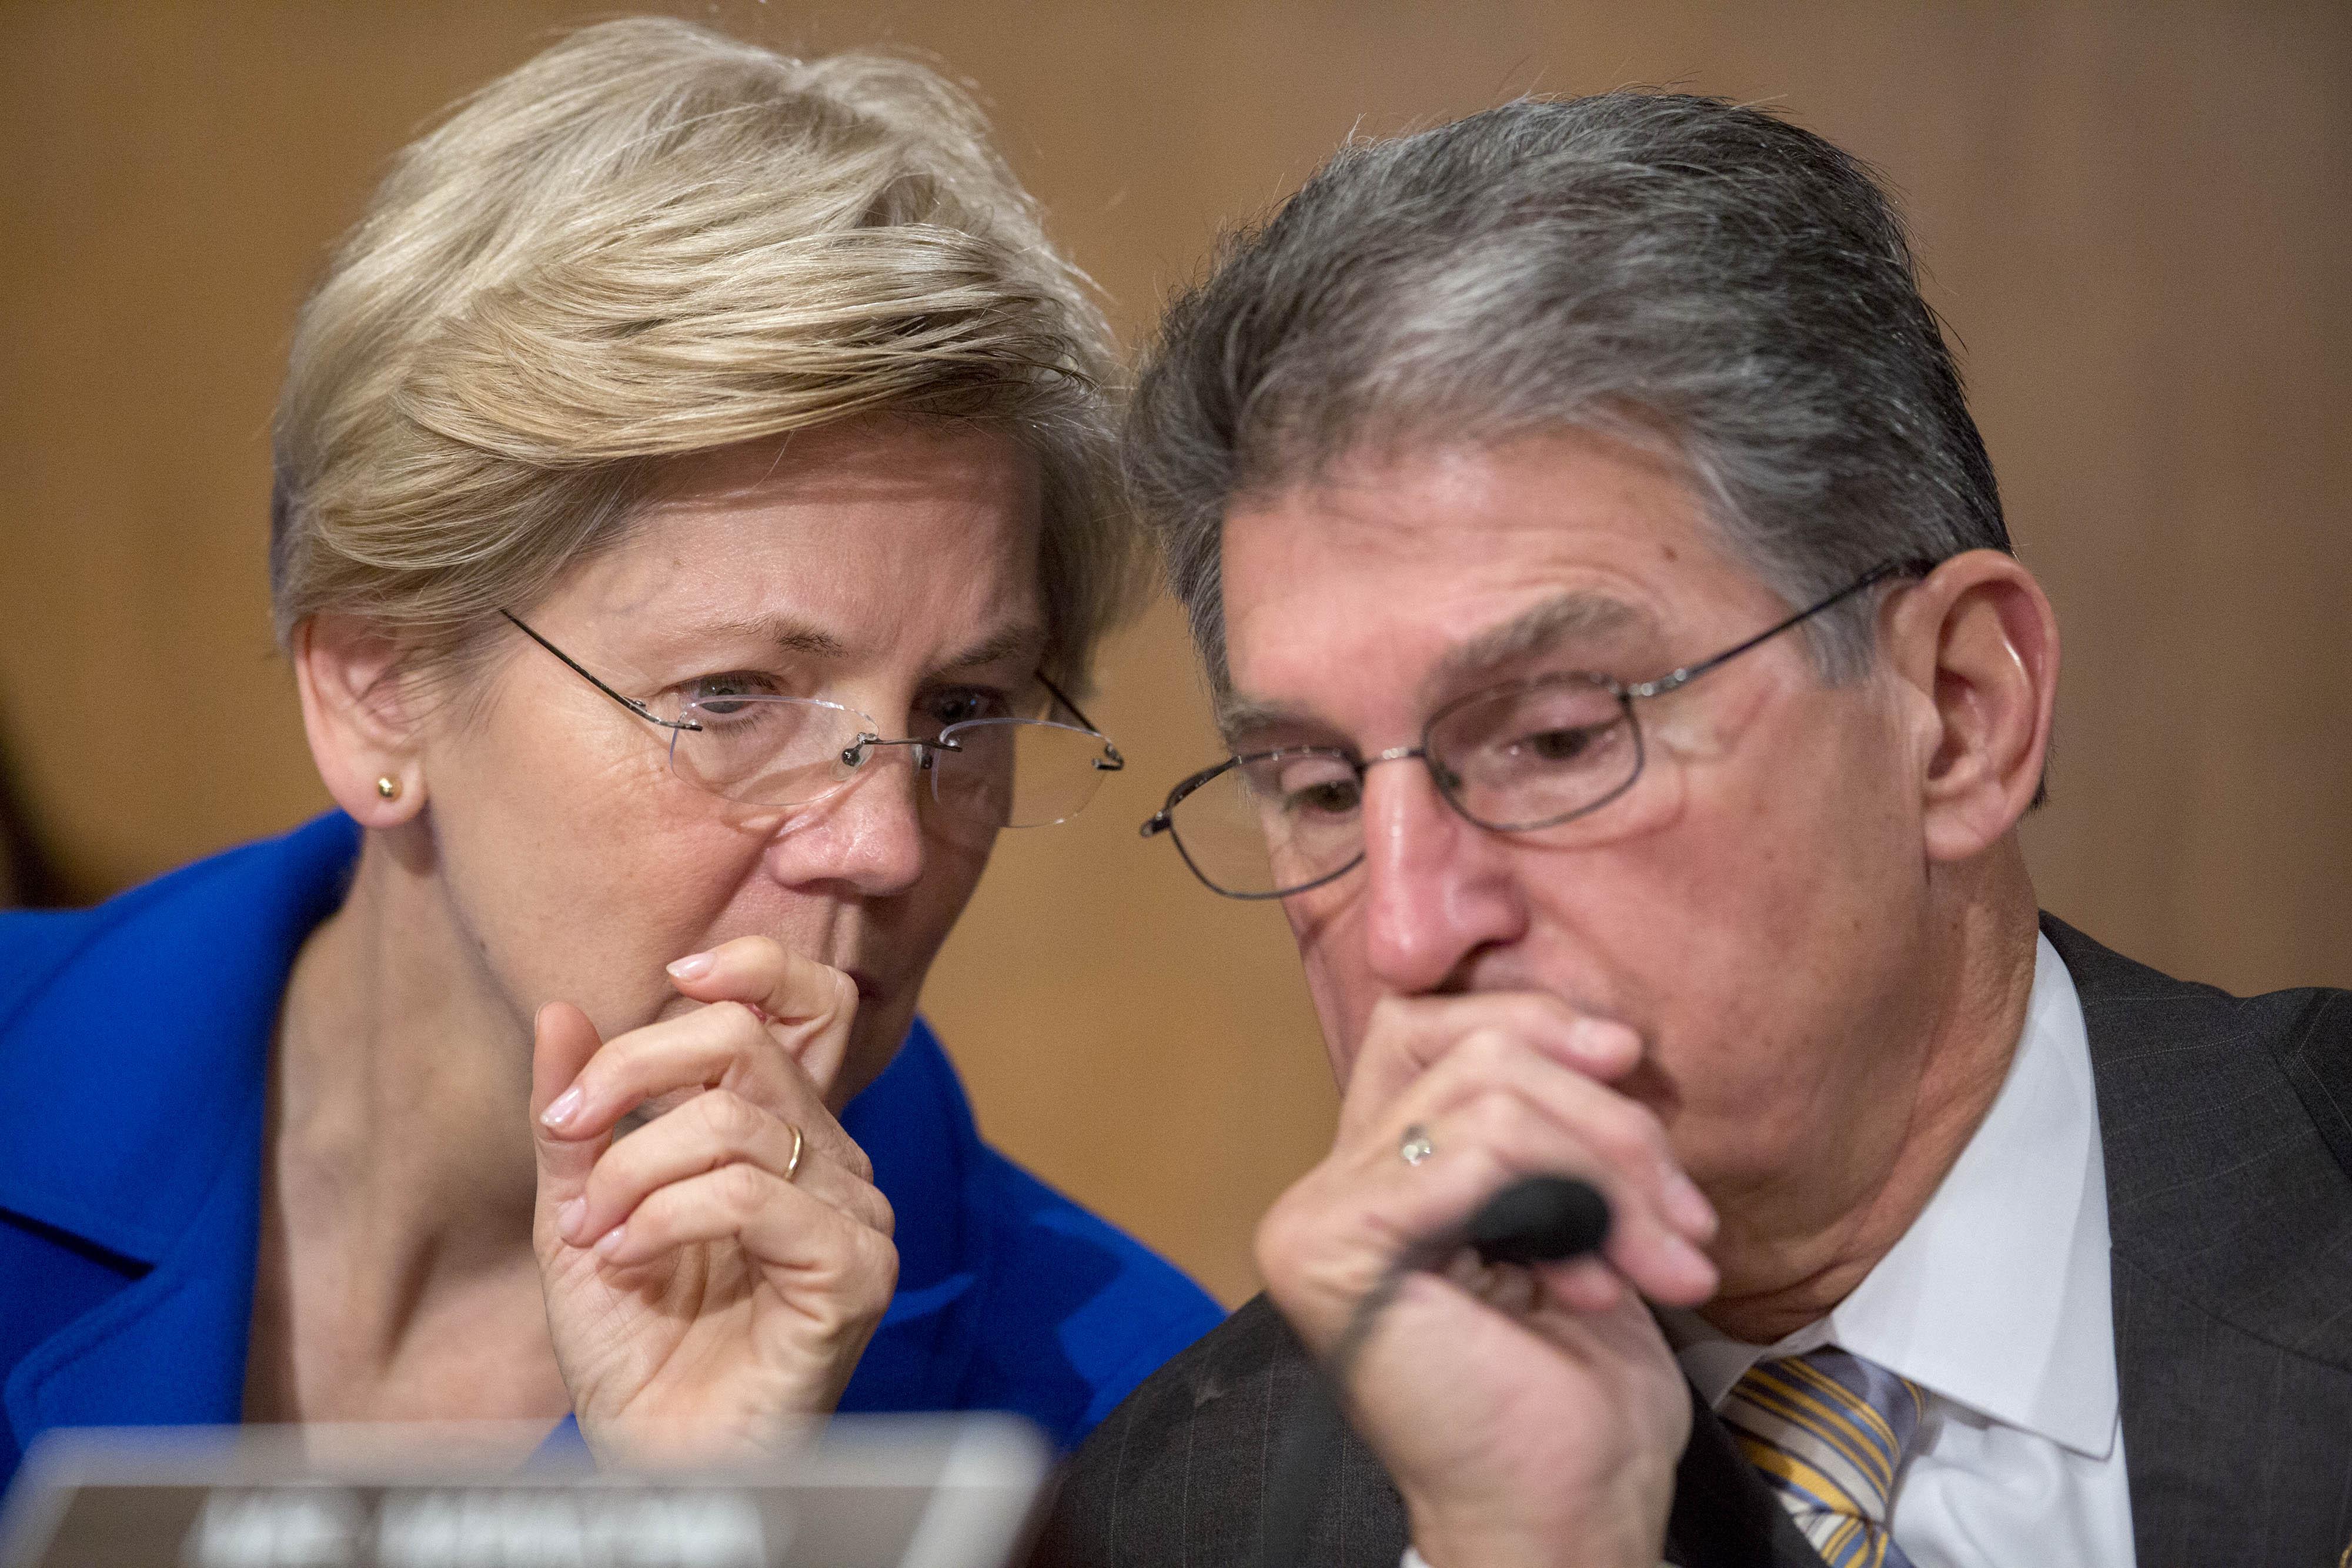 From Left: Senator Elizabeth Warren a Democrat from Massachusetts speaks with Senator Joe Manchin a Democrat from West Virginia during a Senate Banking Subcommittee in Washington, D.C. on Nov. 21, 2014.